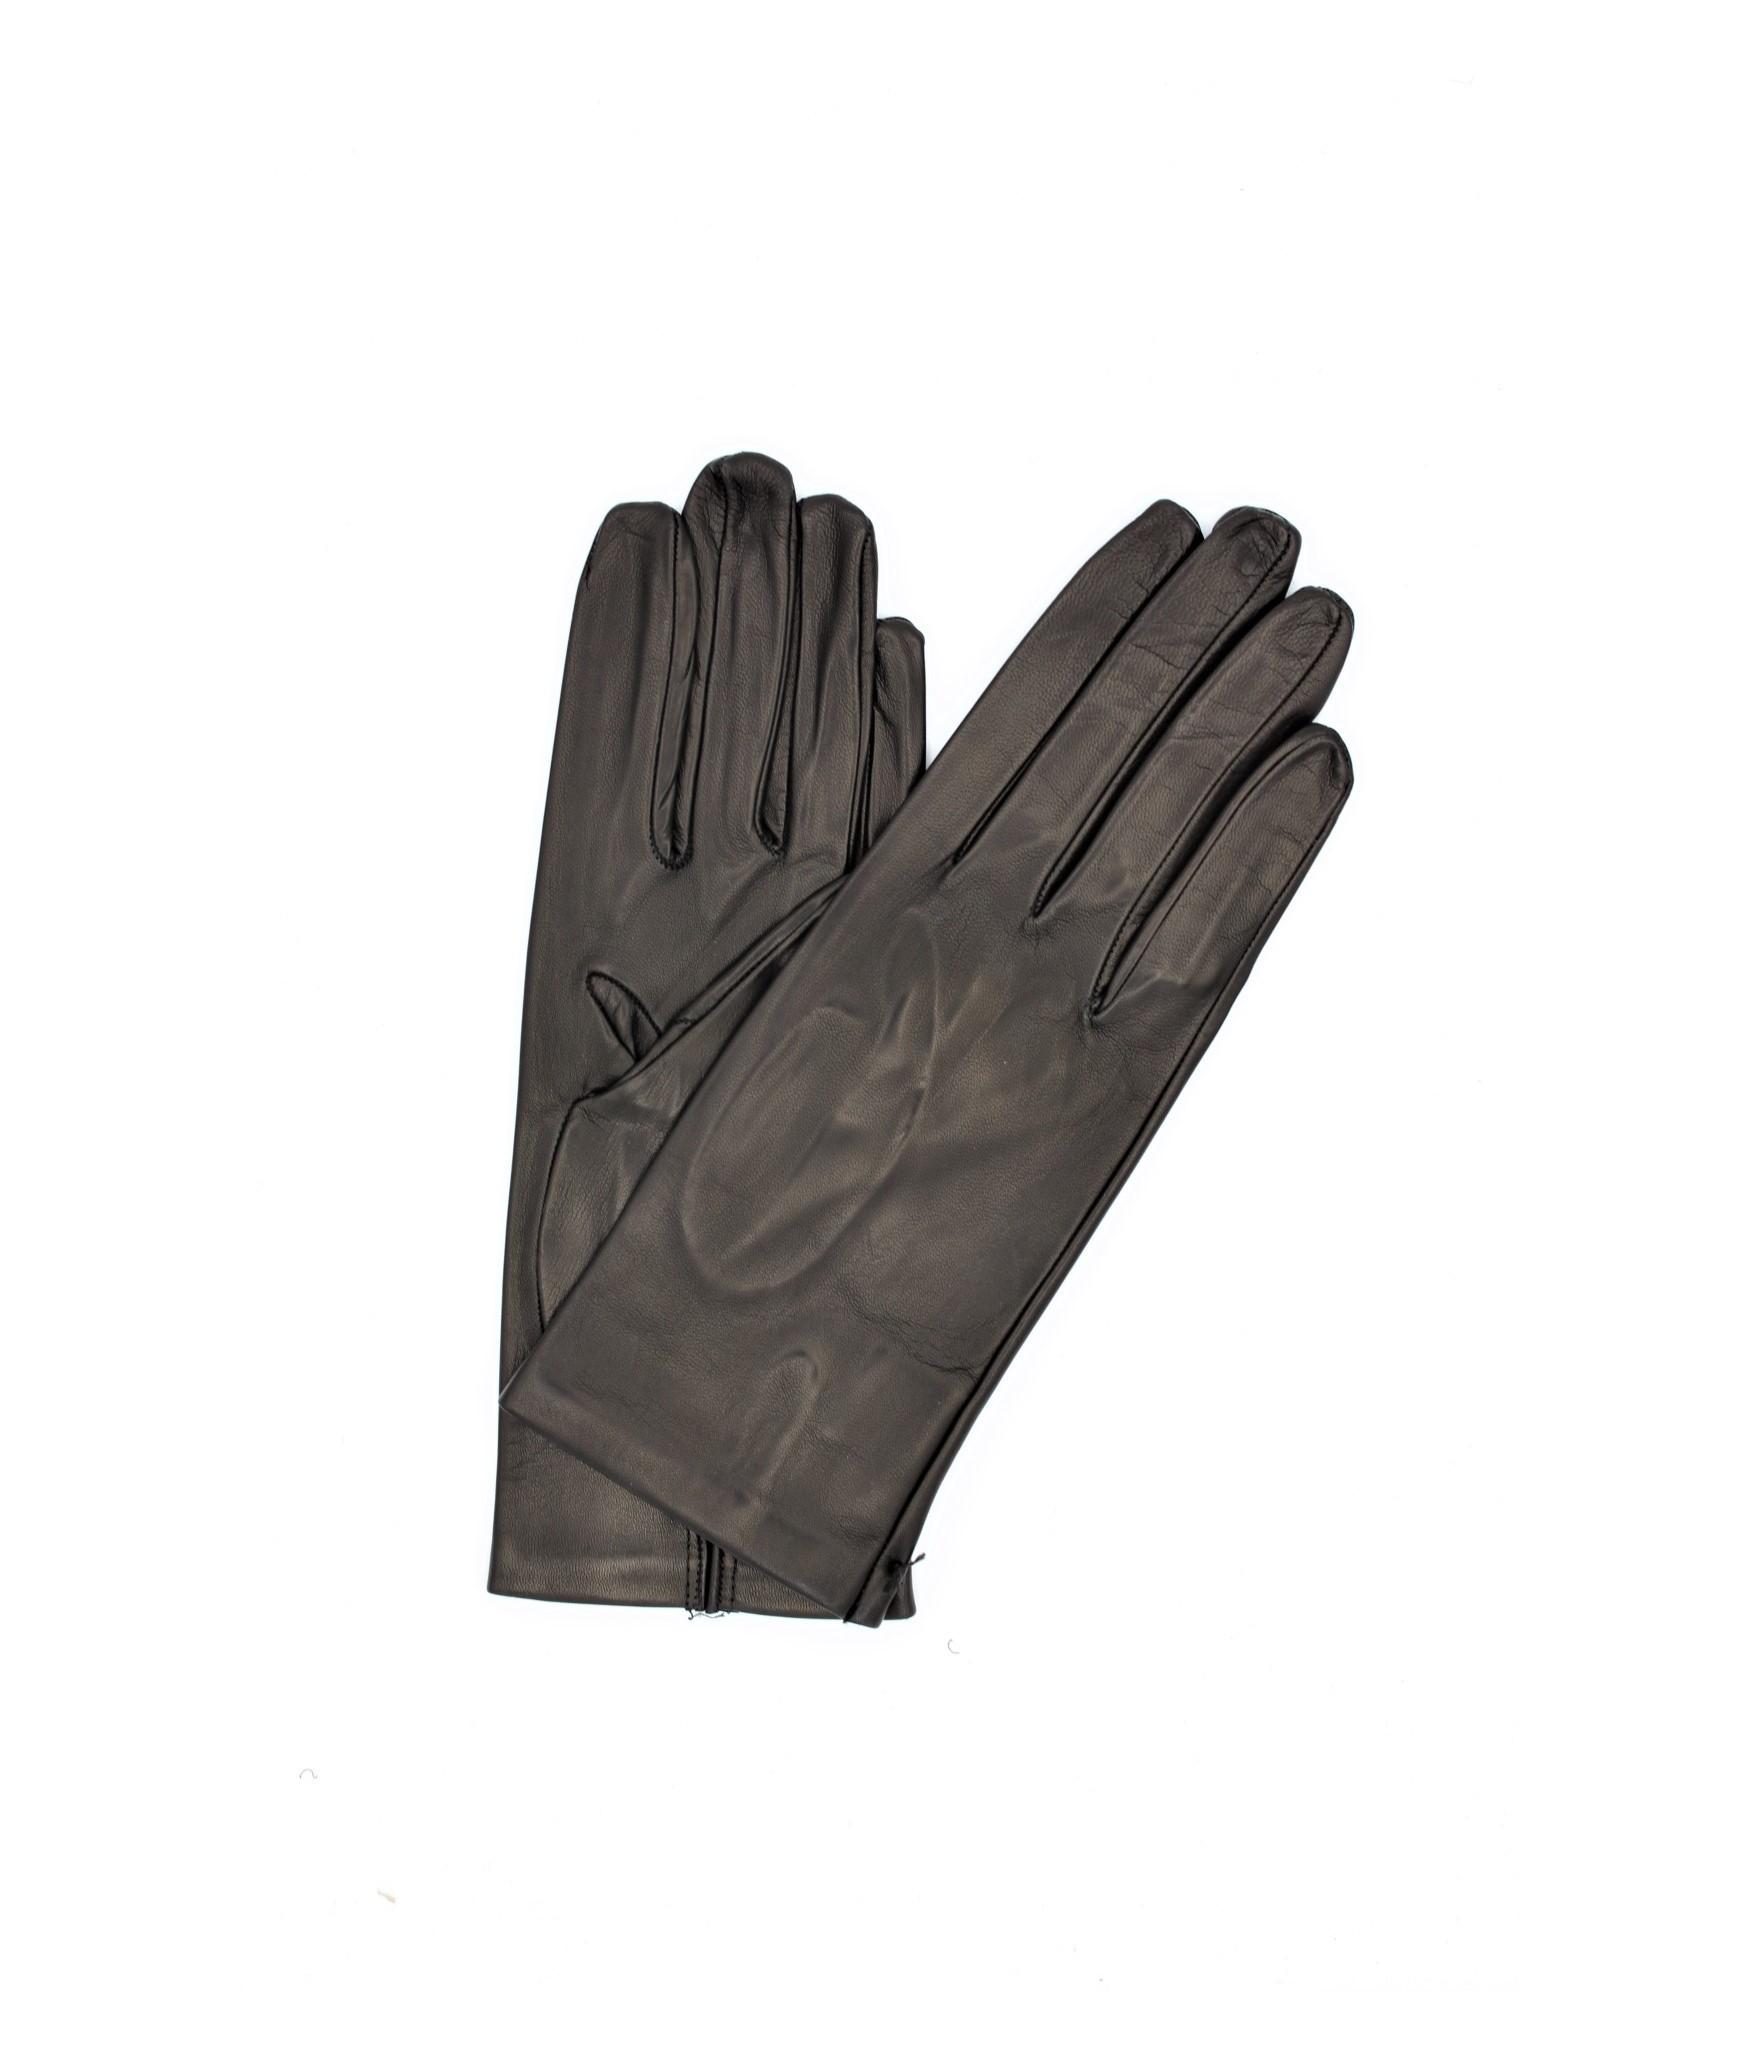 Nappa leather gloves 2bt unlined Black Sermoneta Gloves Leather